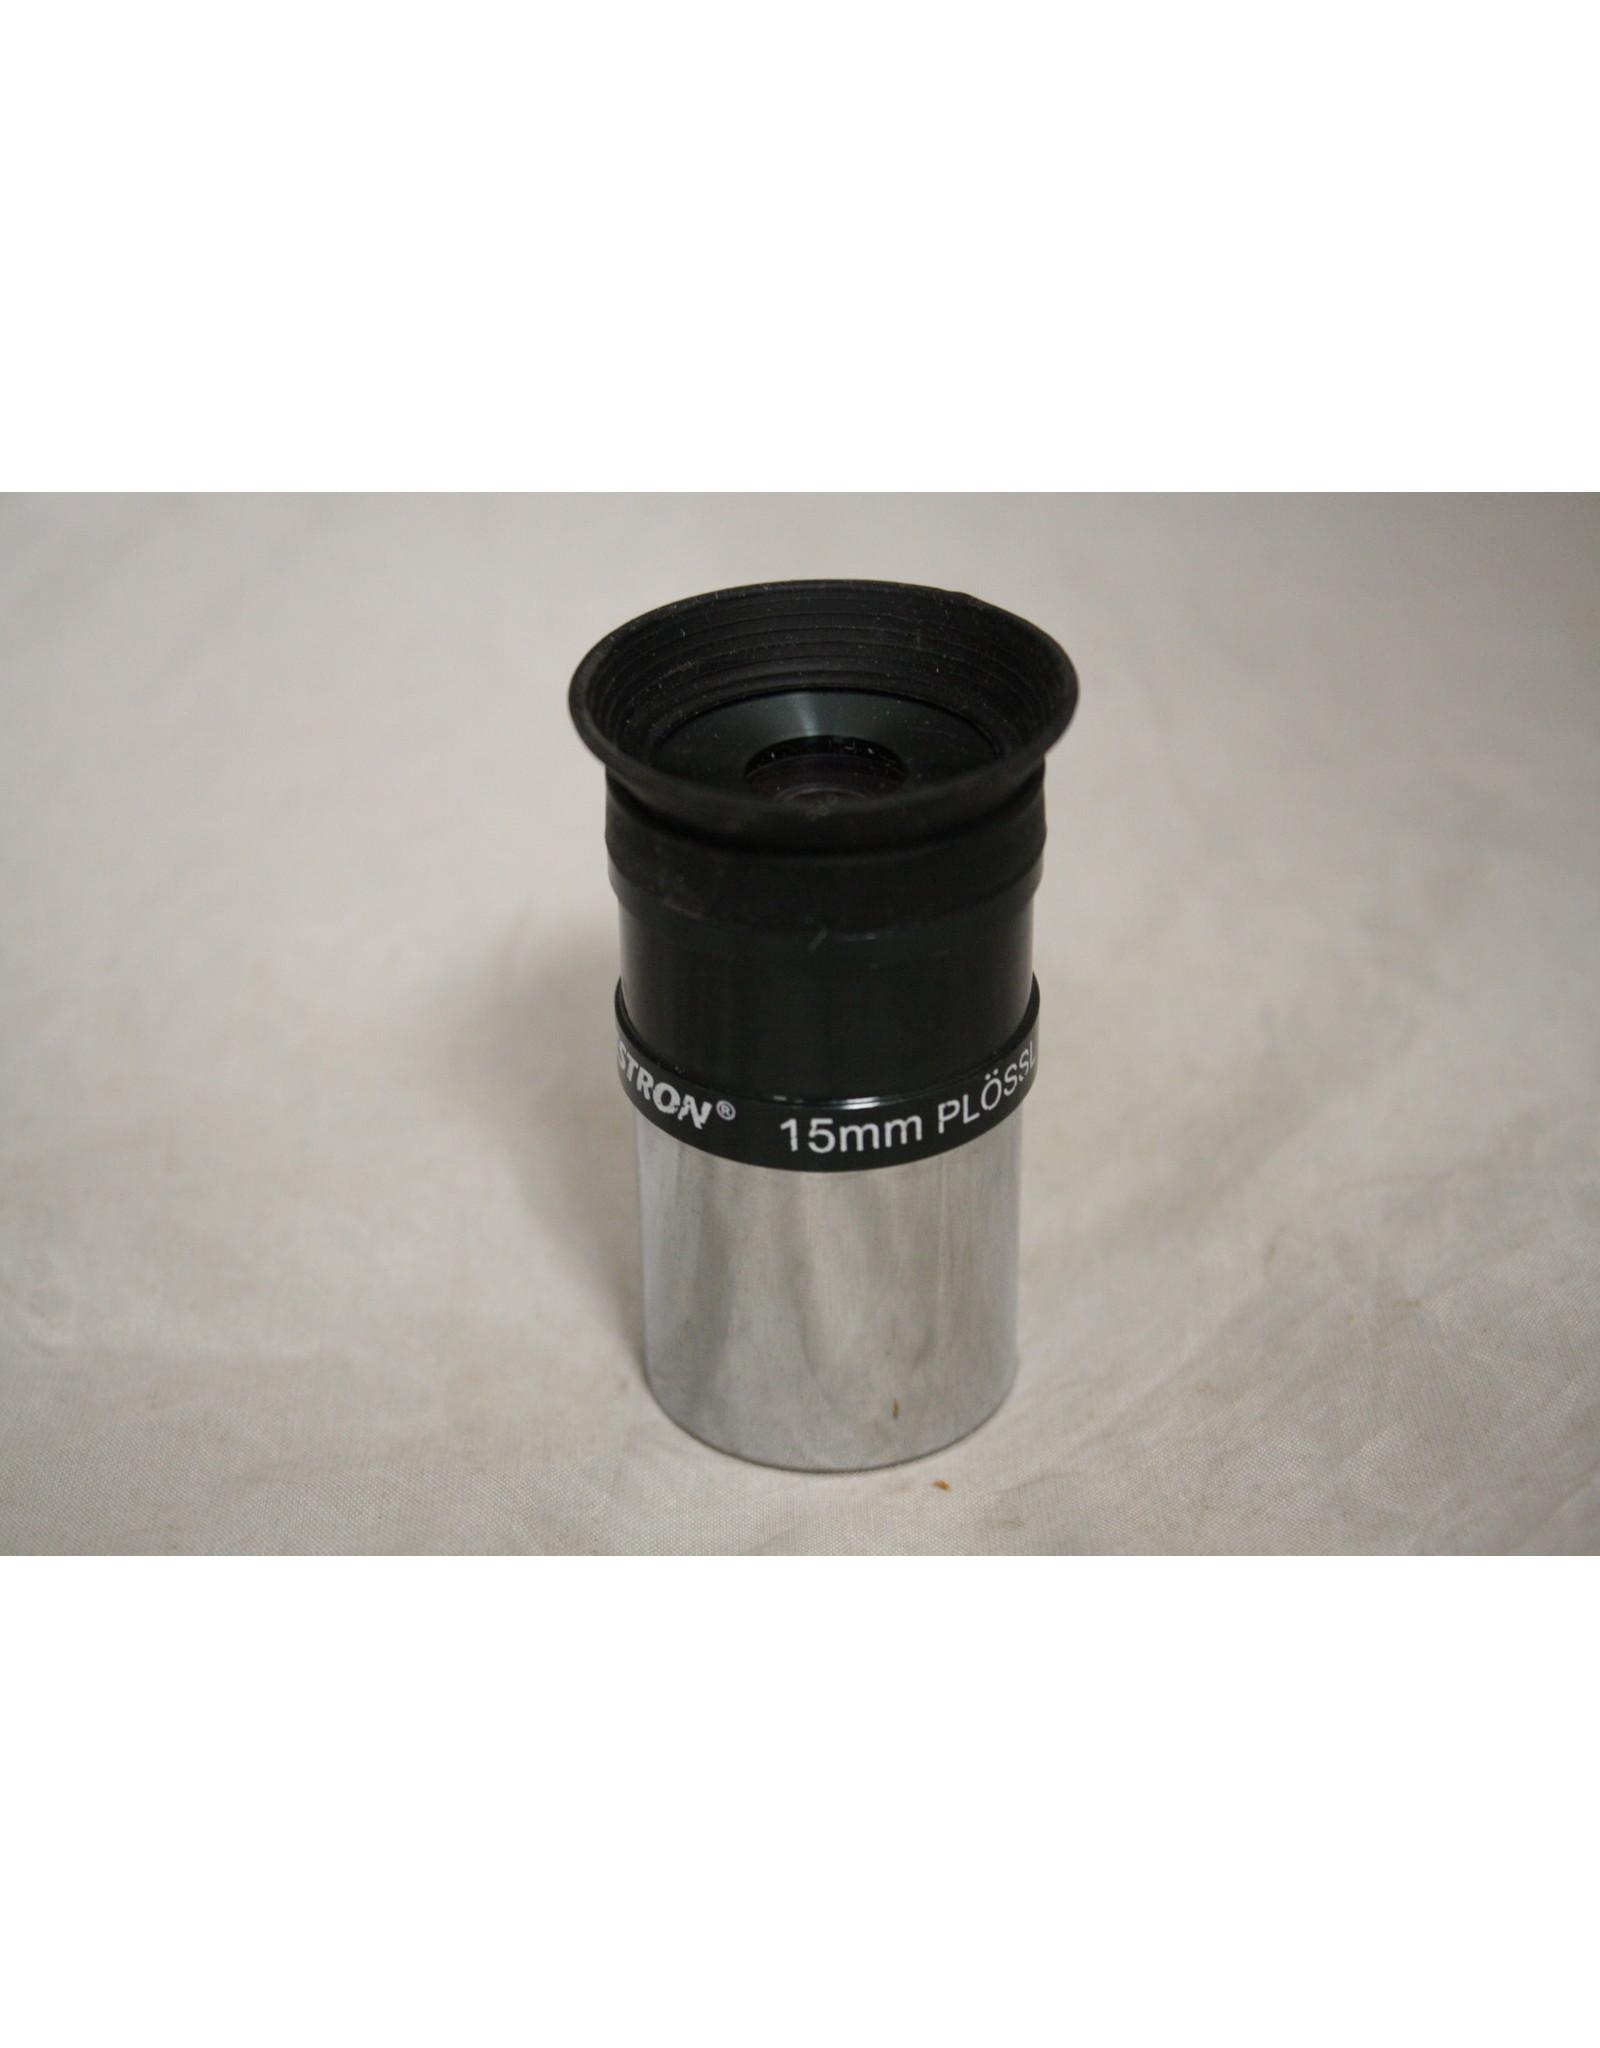 Celestron 15mm Plossl (Pre-owned)